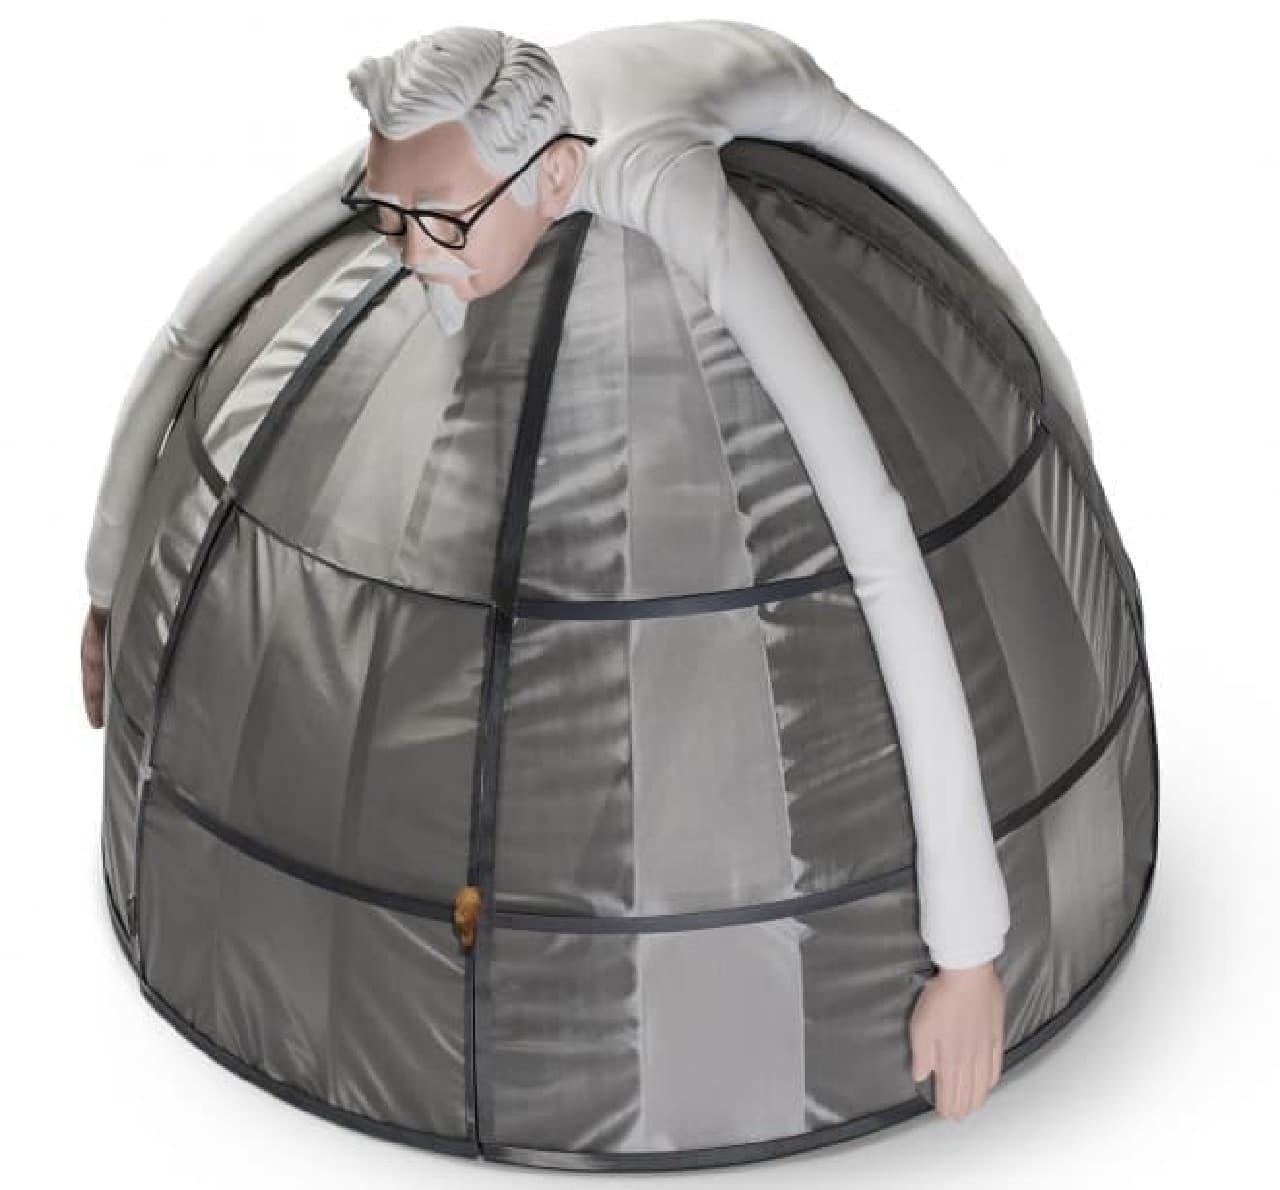 KFCの携帯電波遮断テント「Internet Escape Pod」